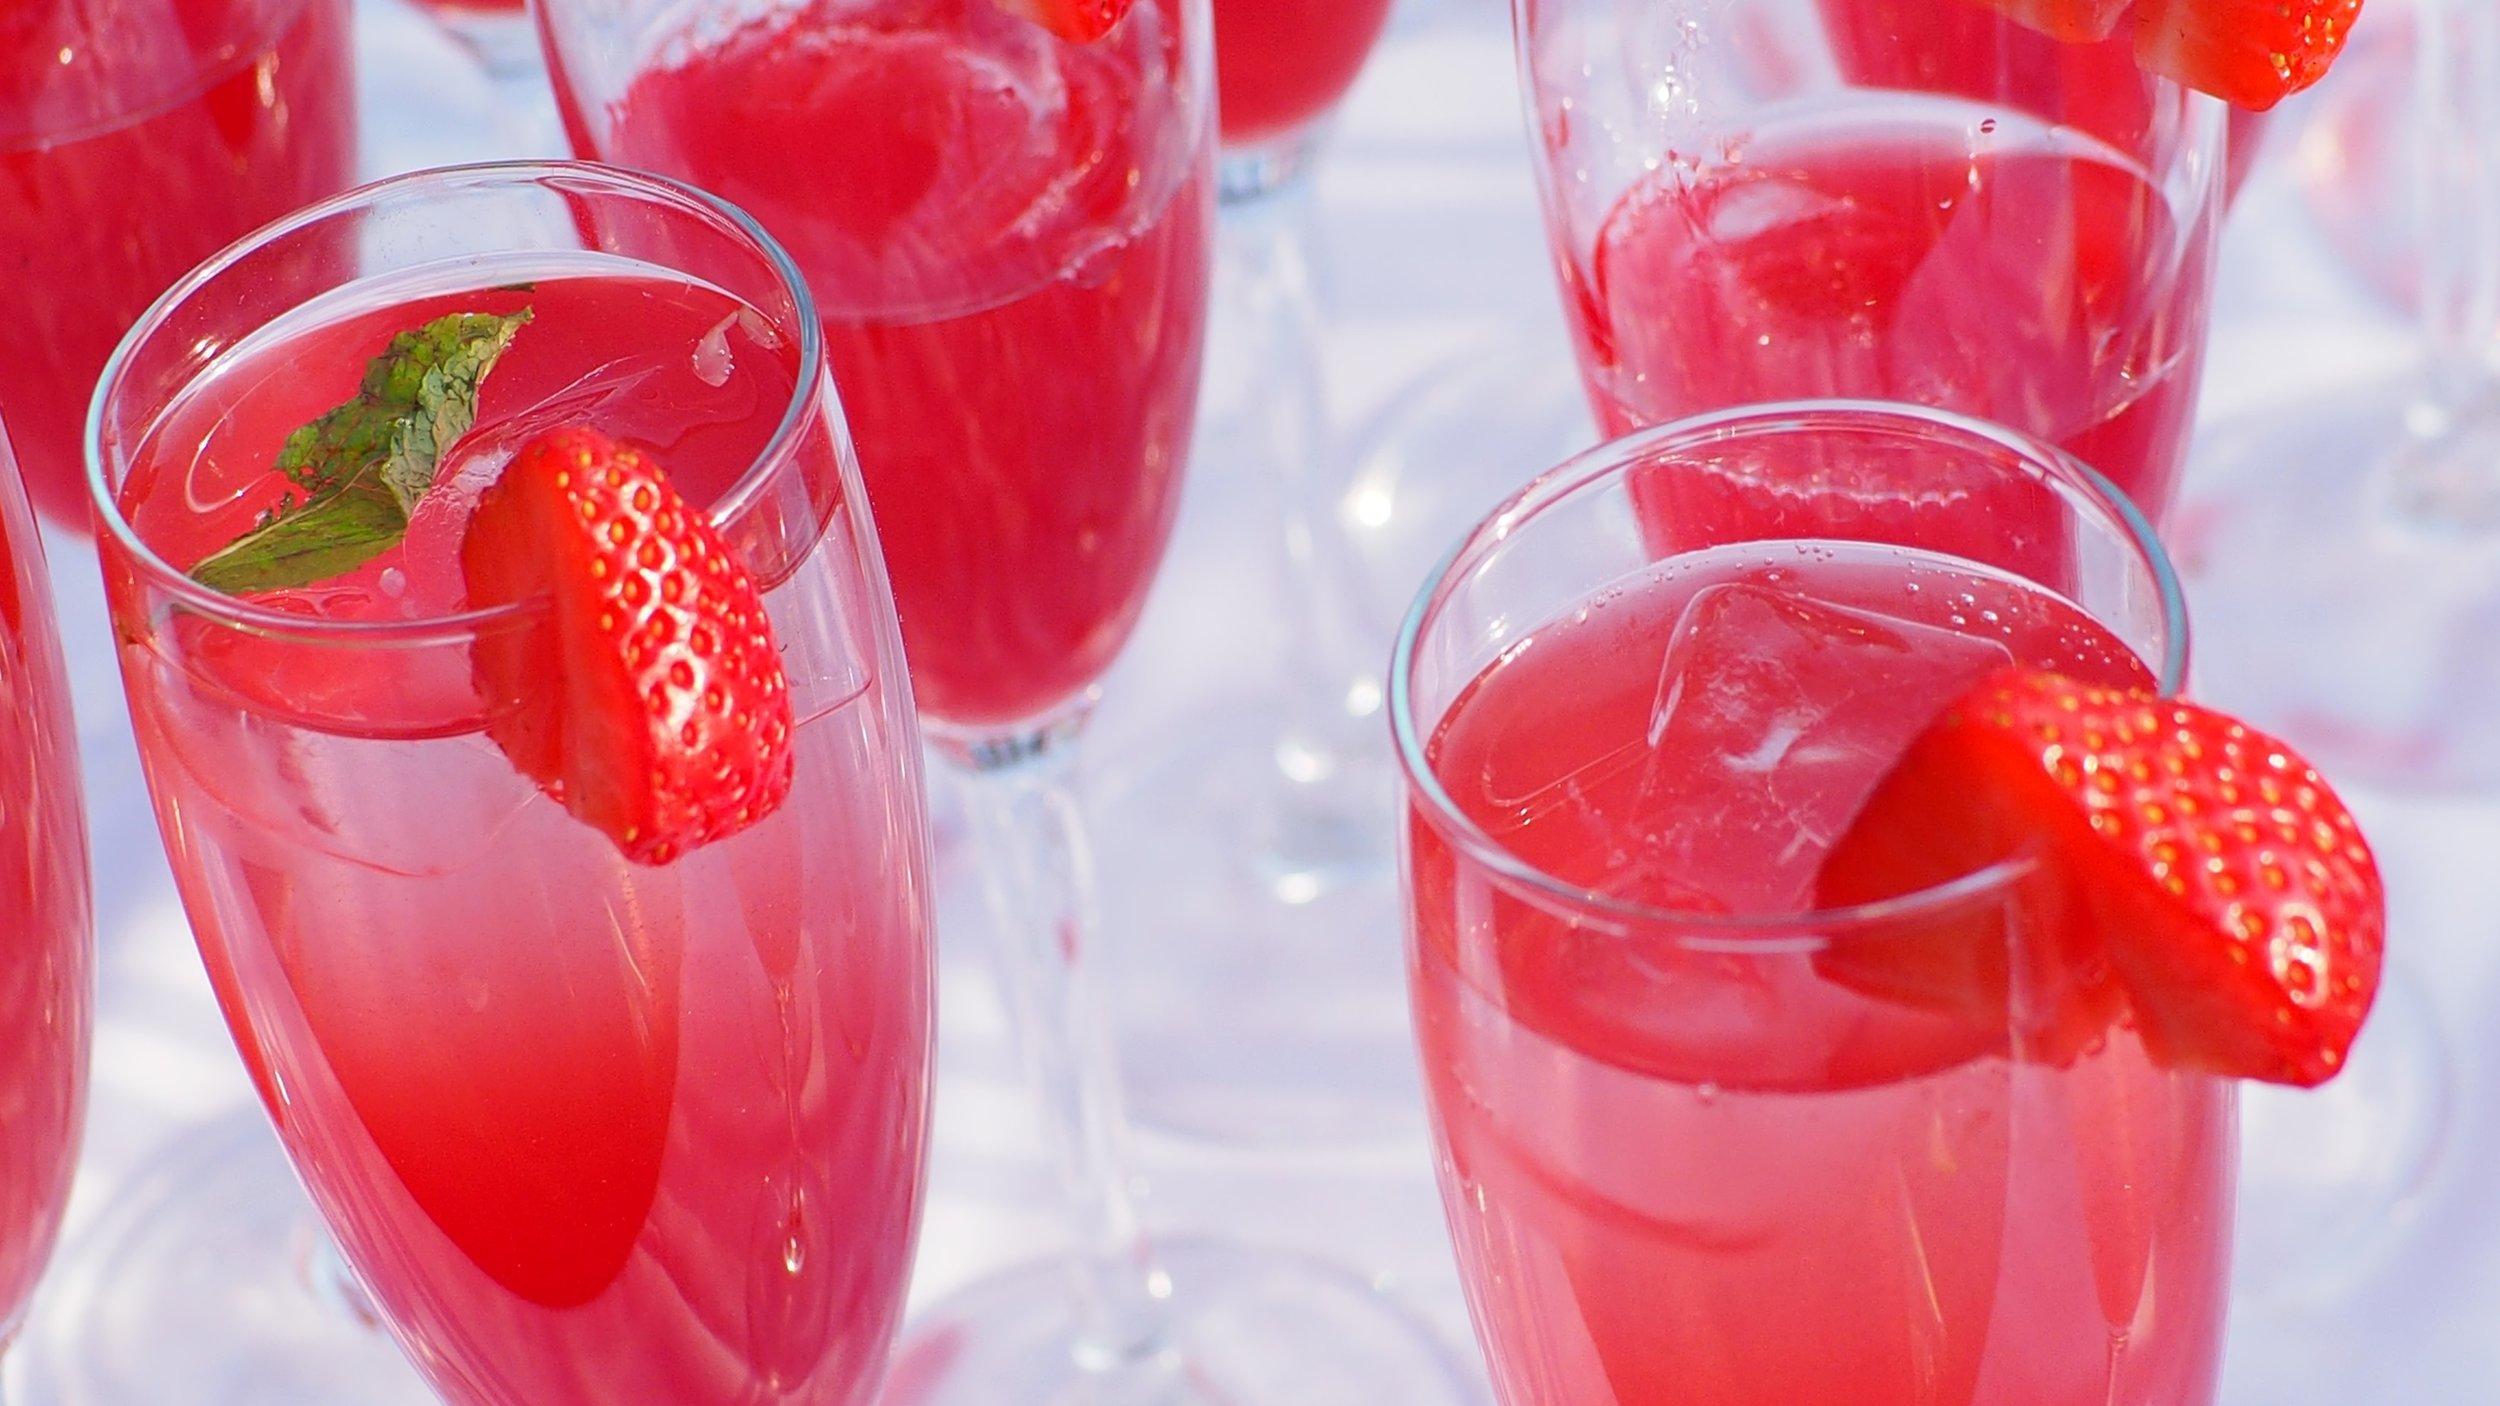 beverage-beverages-catering-1074107.jpg